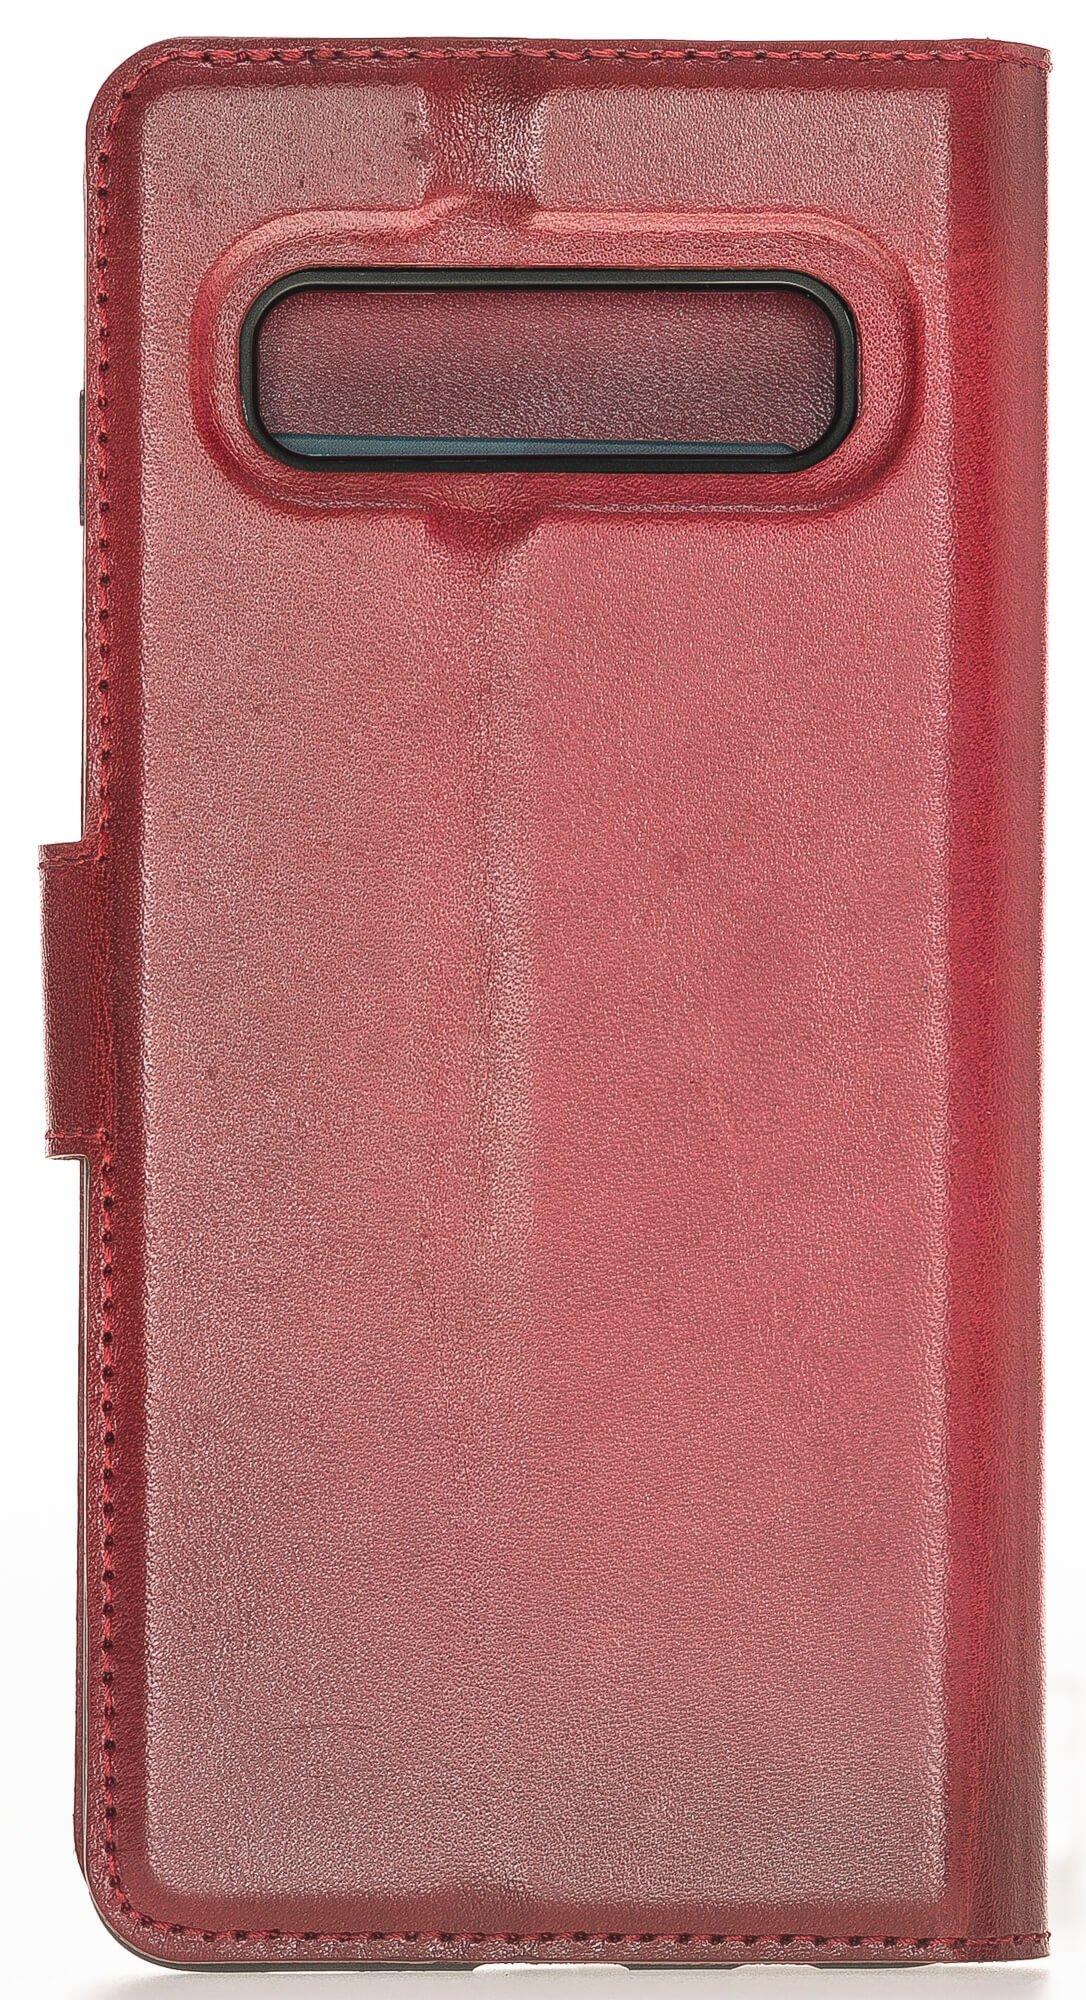 Samsung S10 abnehmbare Lederhülle (2in1) in Rot Burned